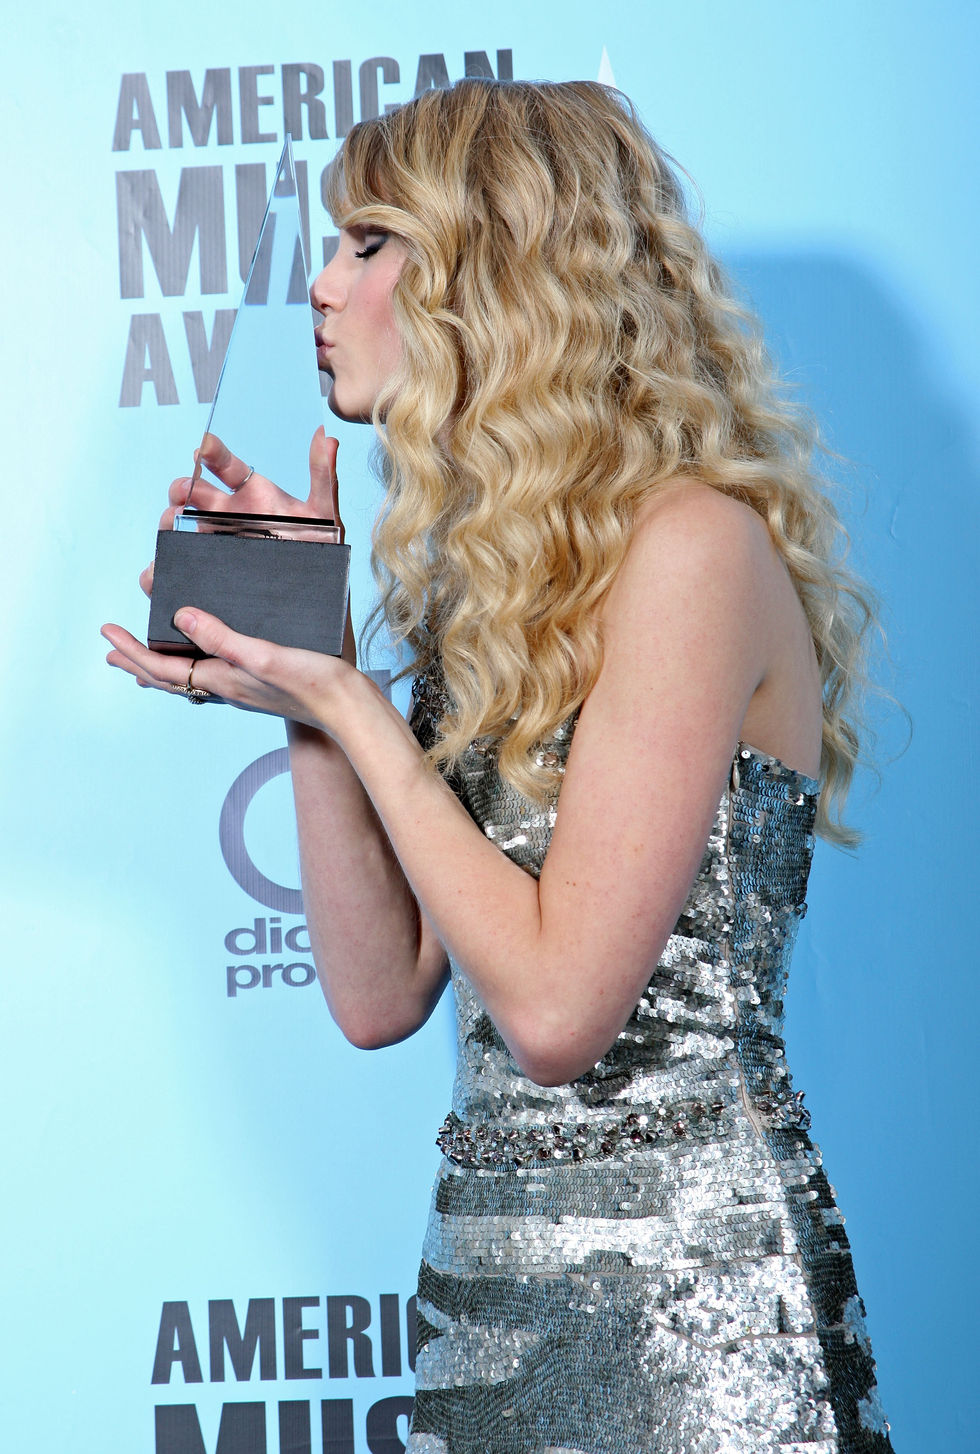 taylor-swift-2008-american-music-awards-19